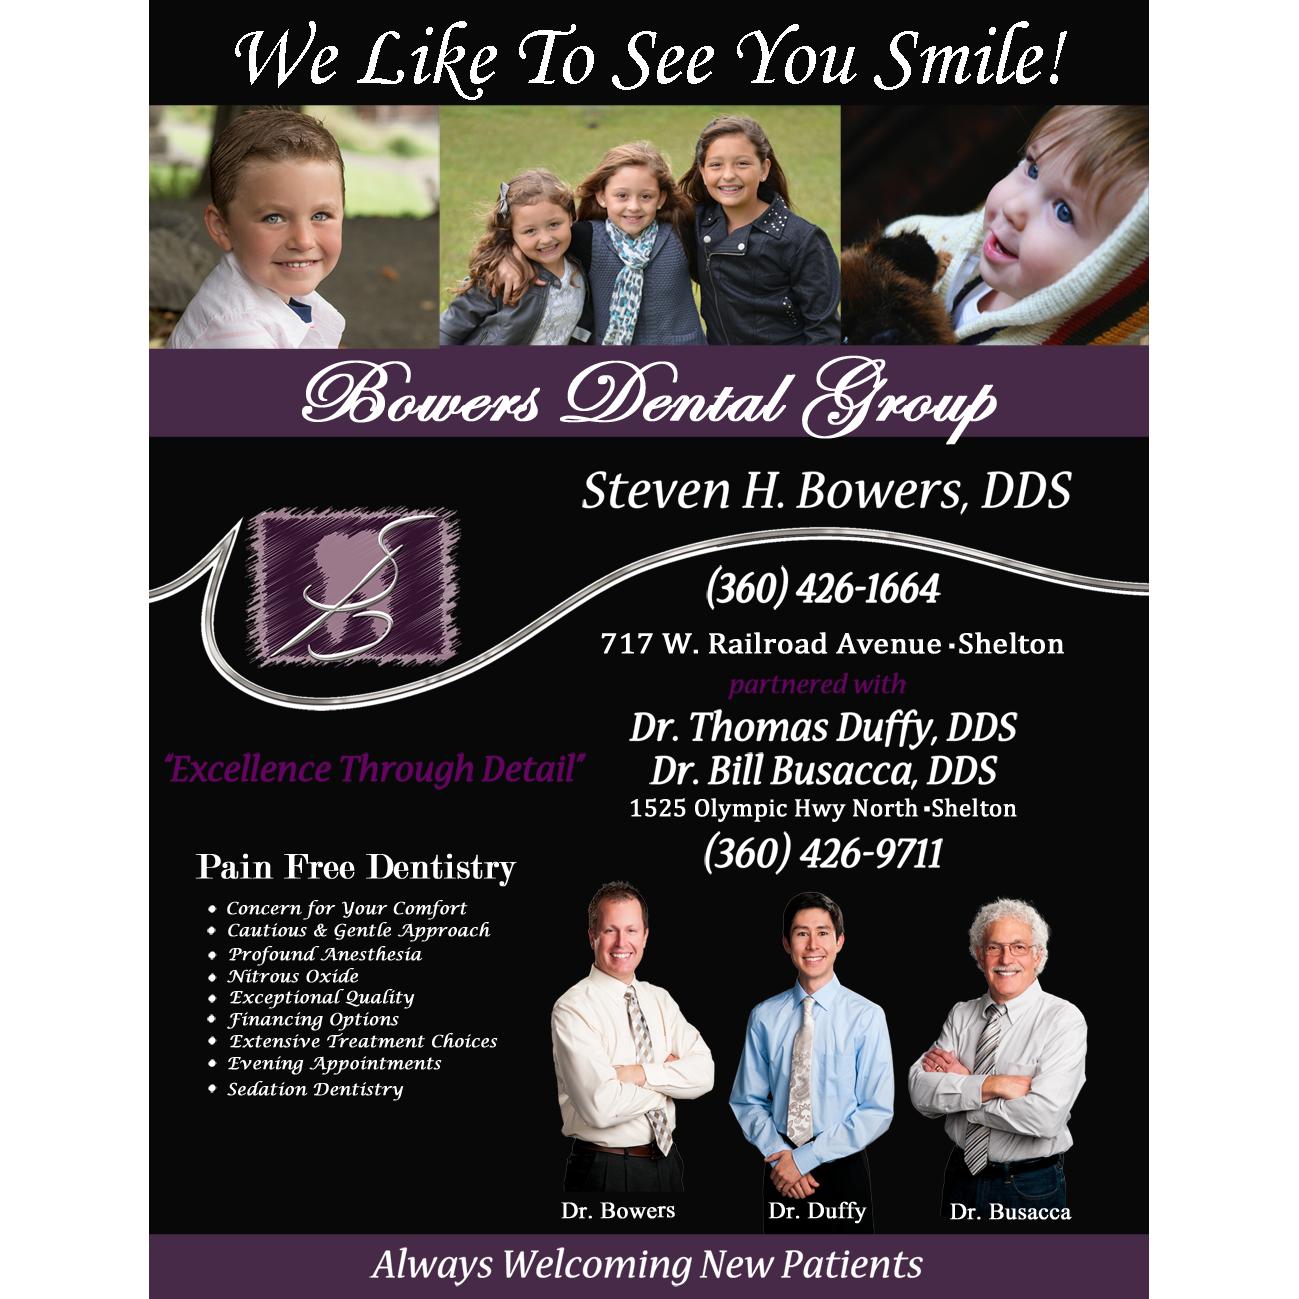 Bowers Dental Group